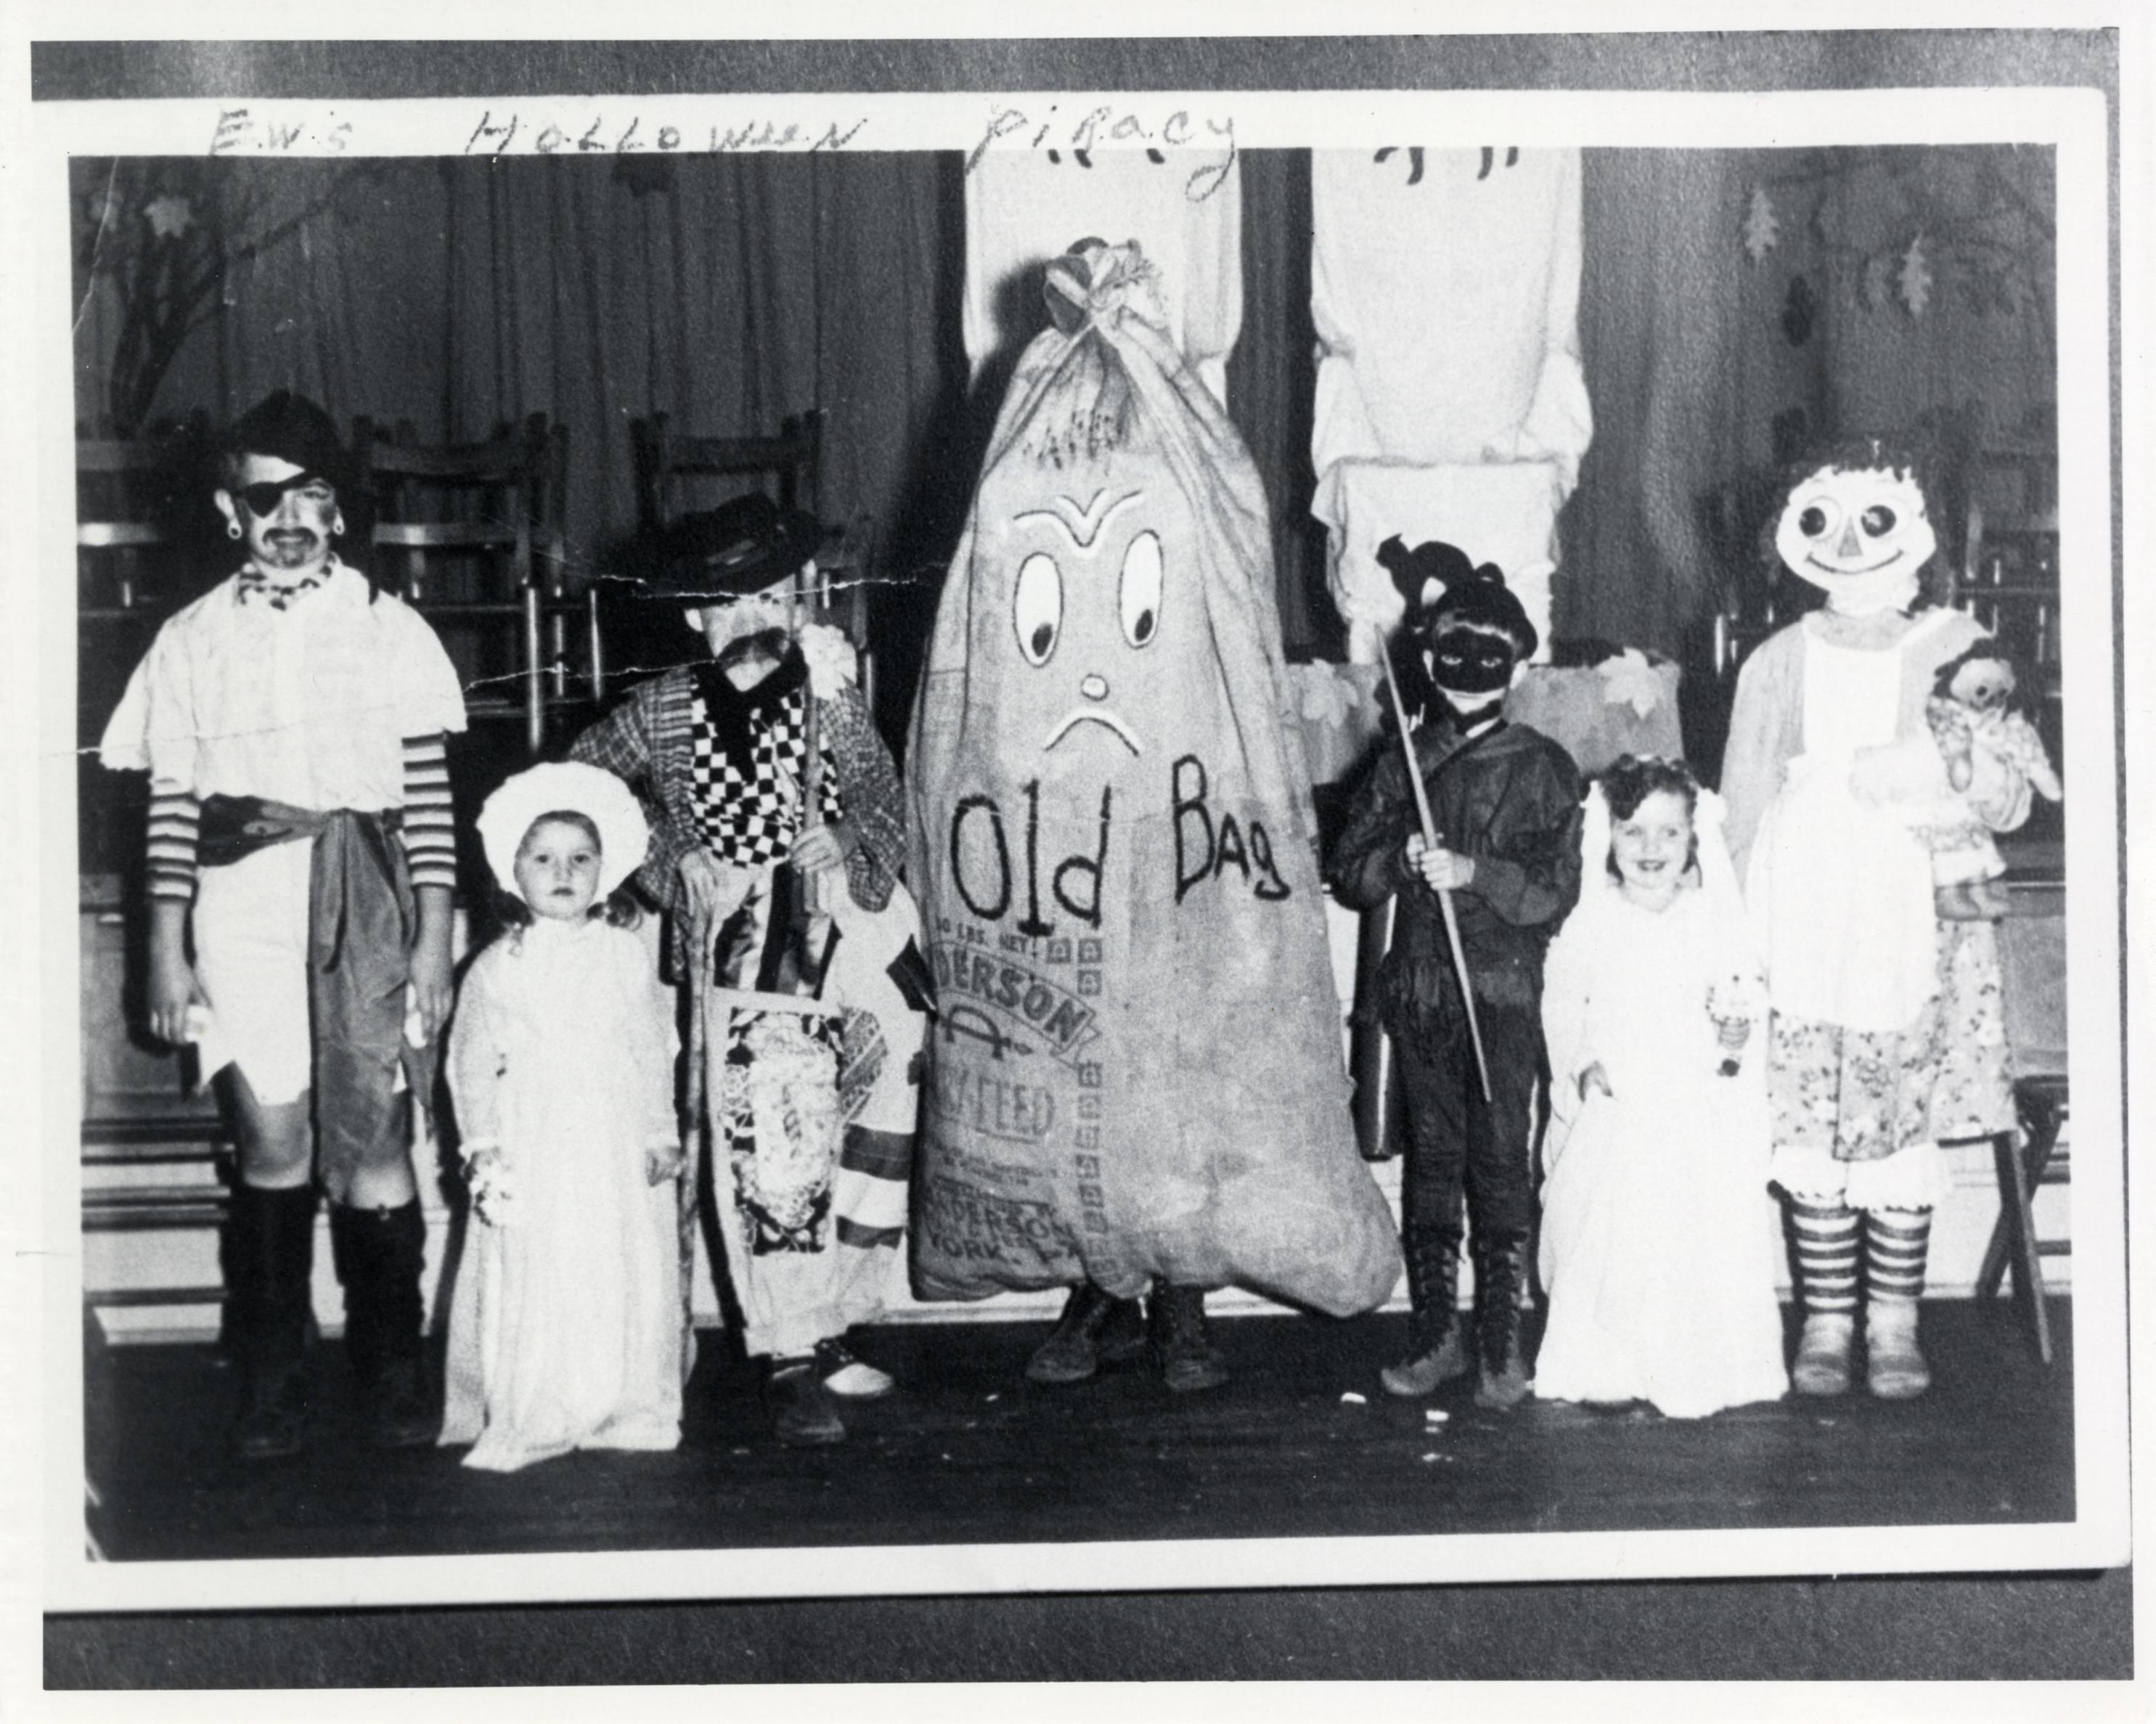 Holloween contest - Osbourne High School - 1947